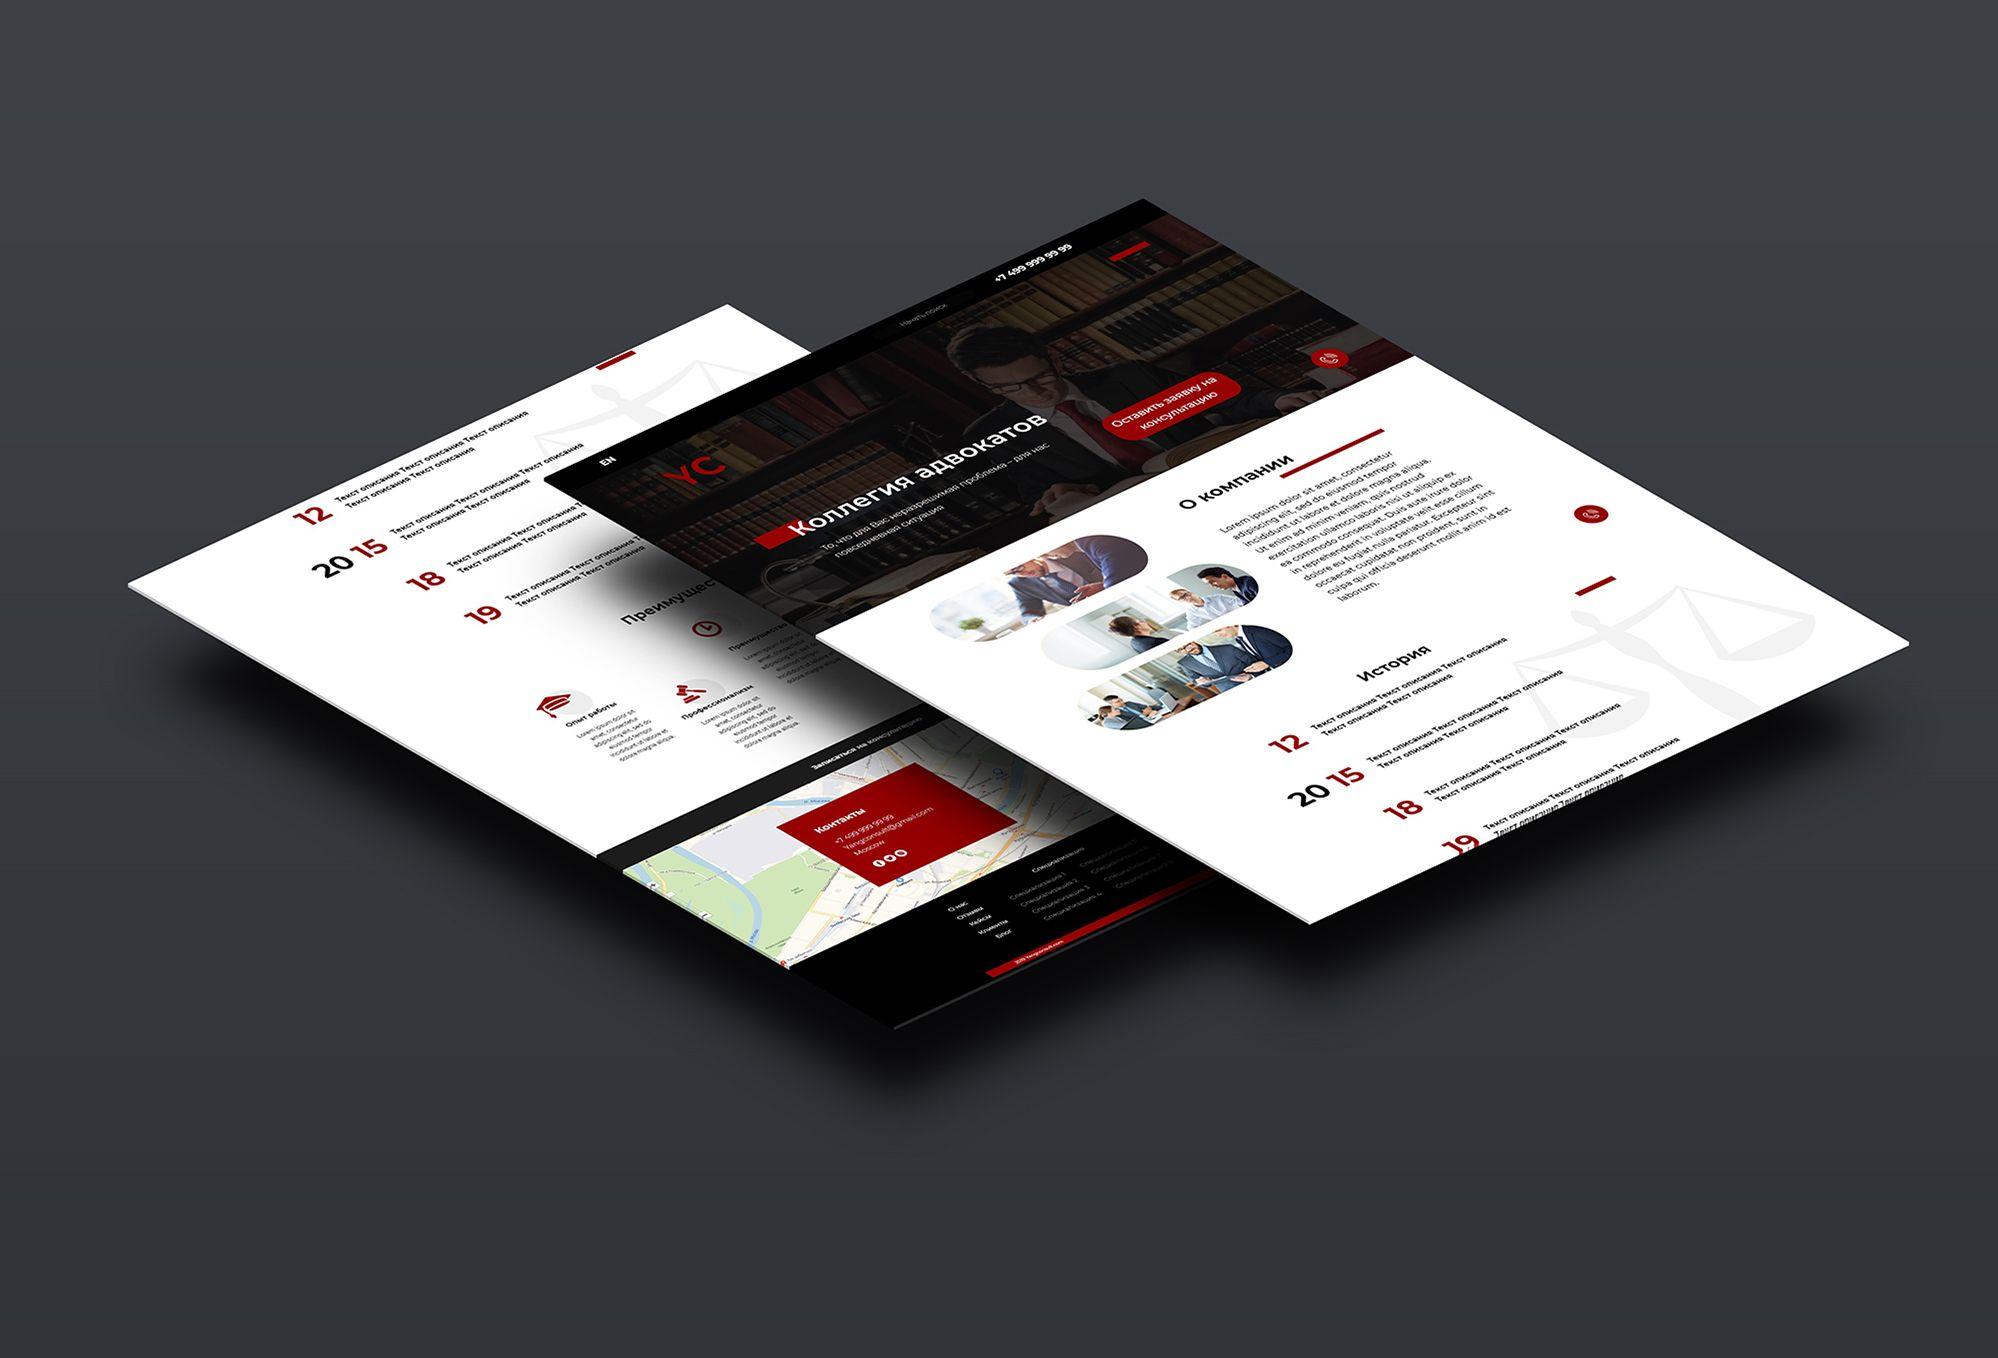 Веб-сайт для Yangconsult.com - дизайнер MashaHai